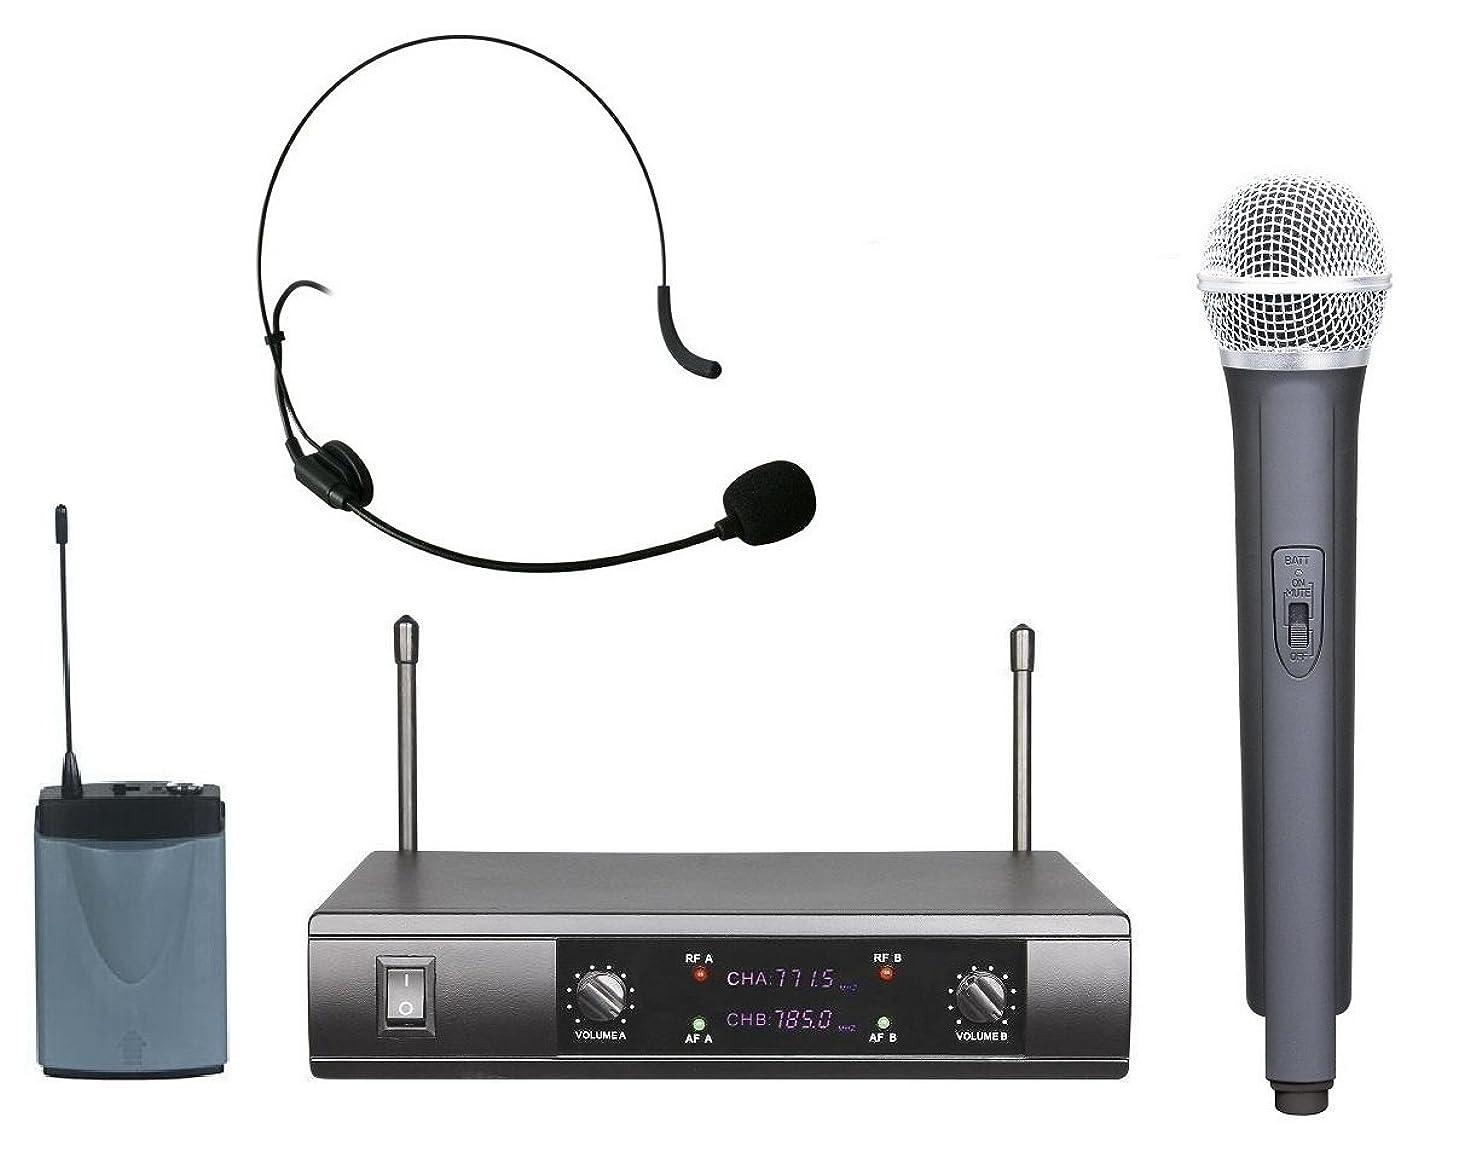 Boly Professional UHF Dual Channels Wireless Radio Handheld Headset Headworn Microphone System